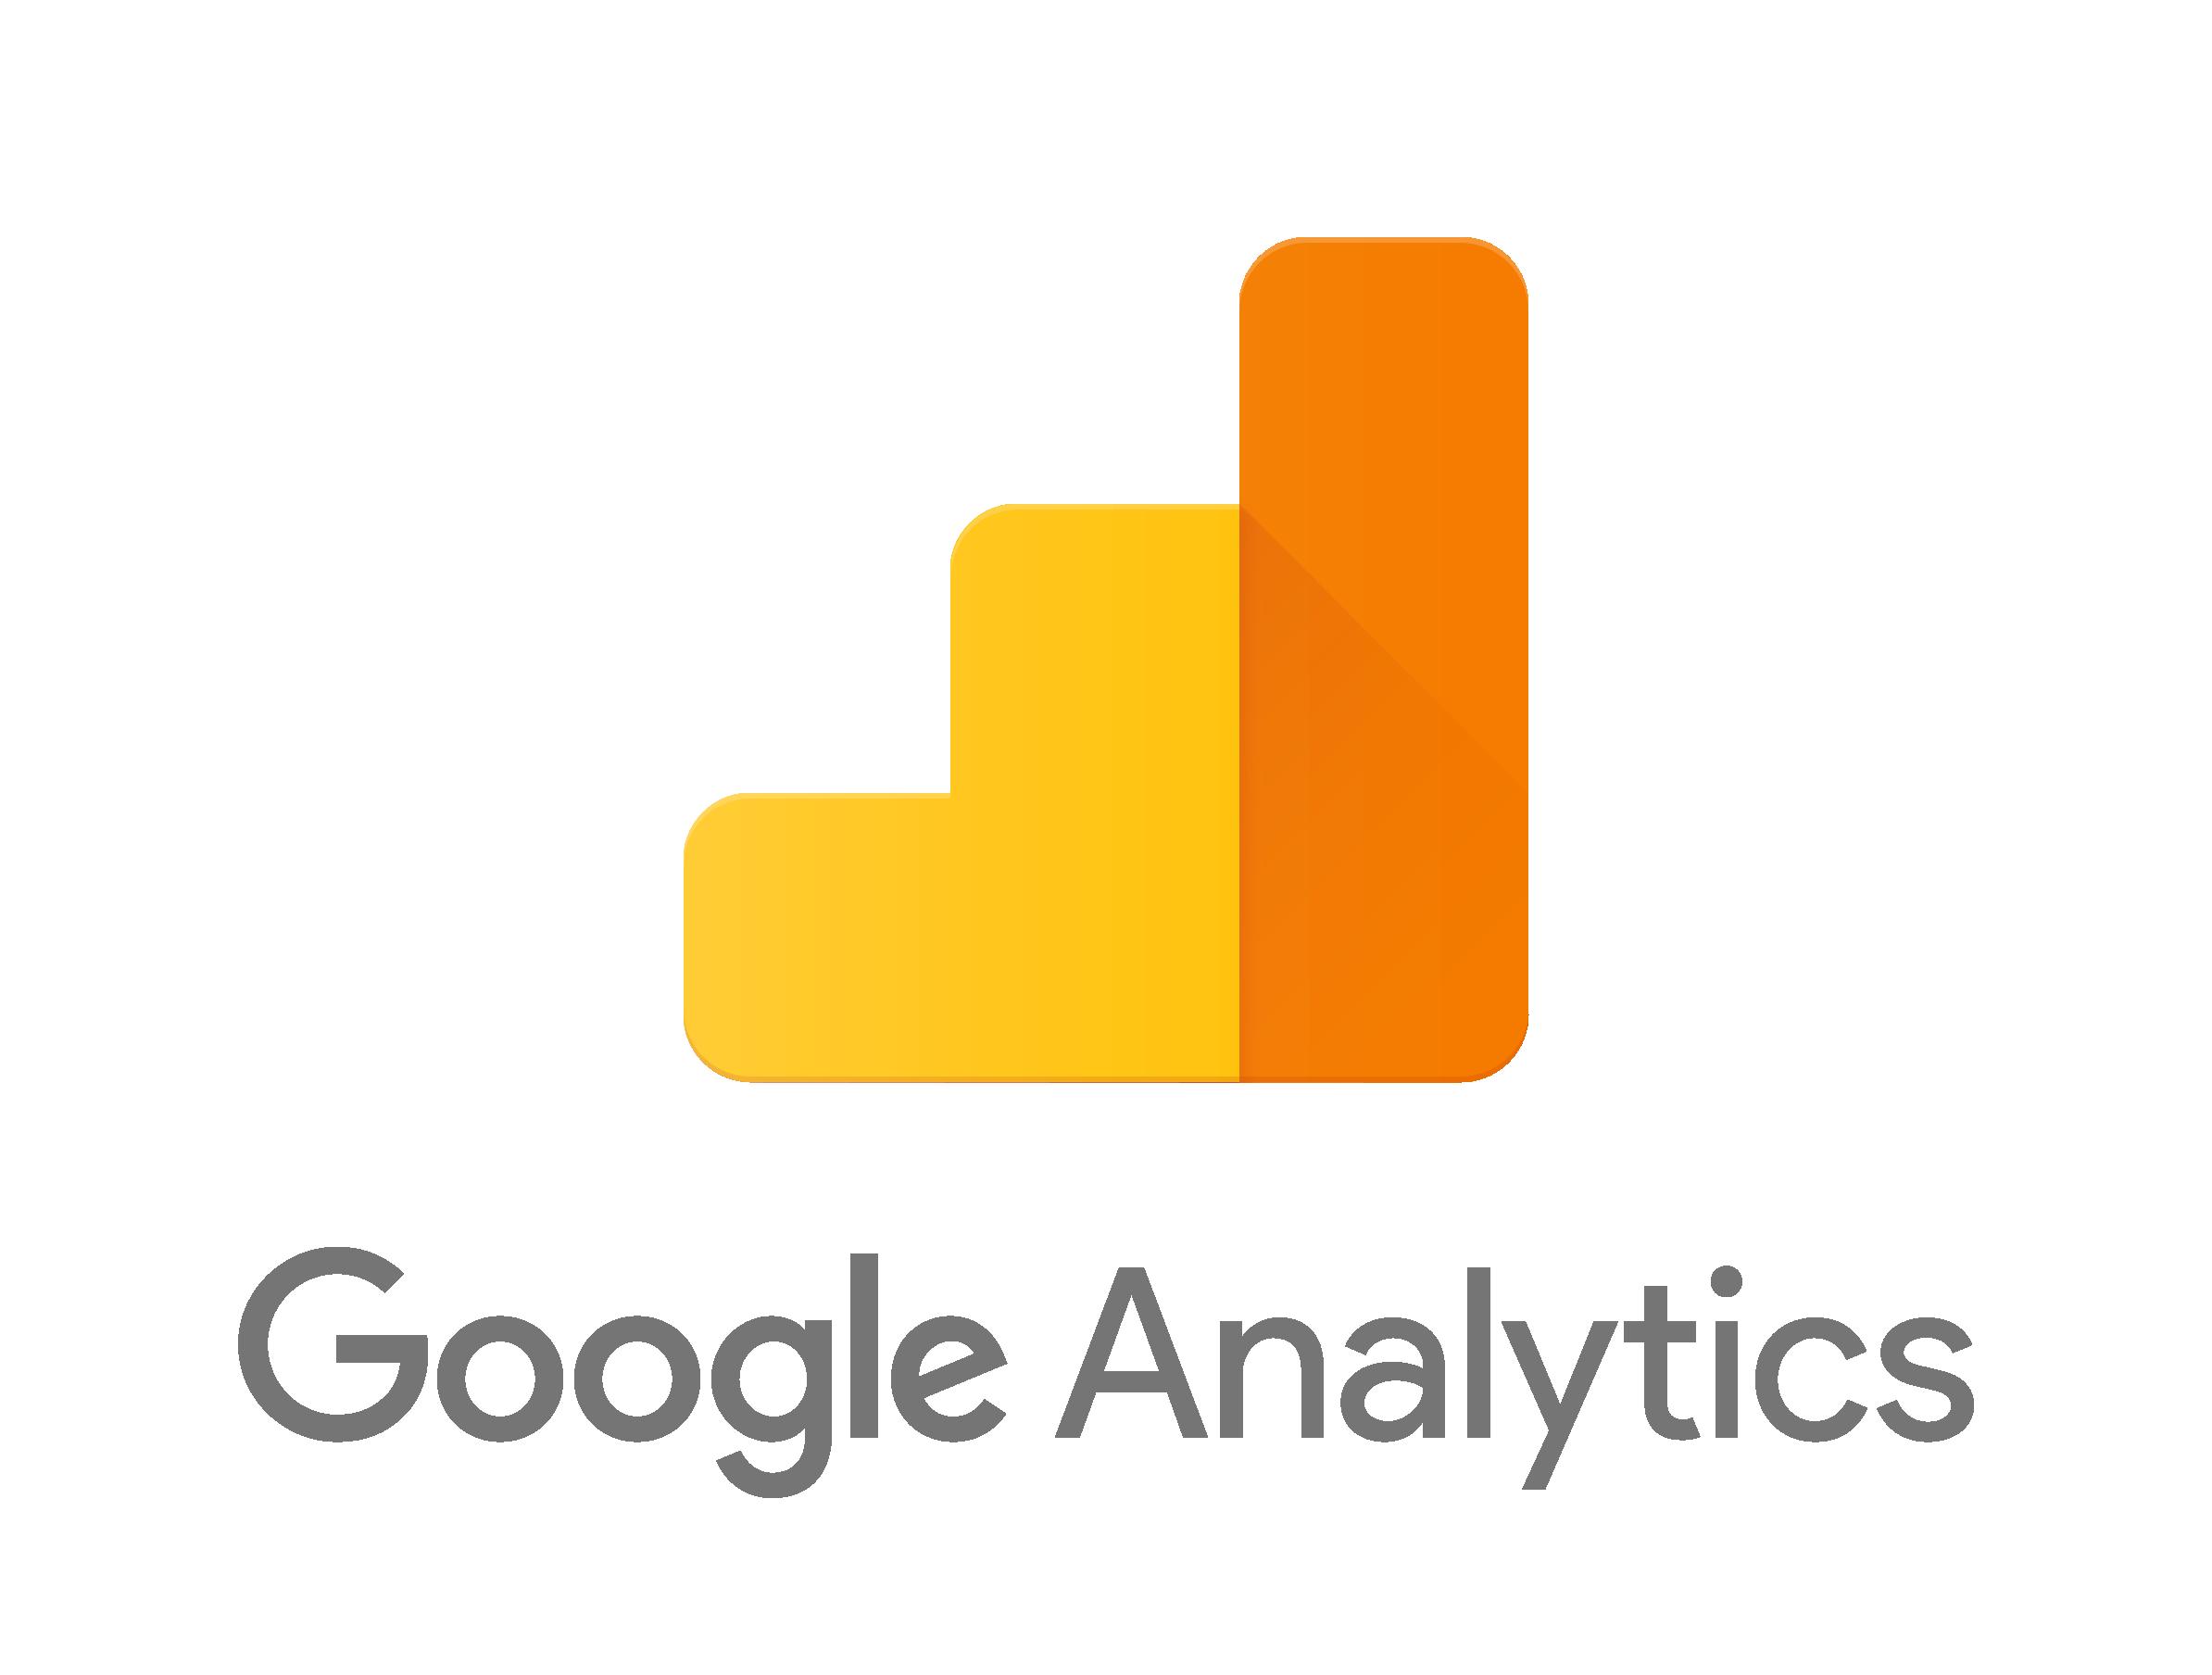 googleanalytics.png